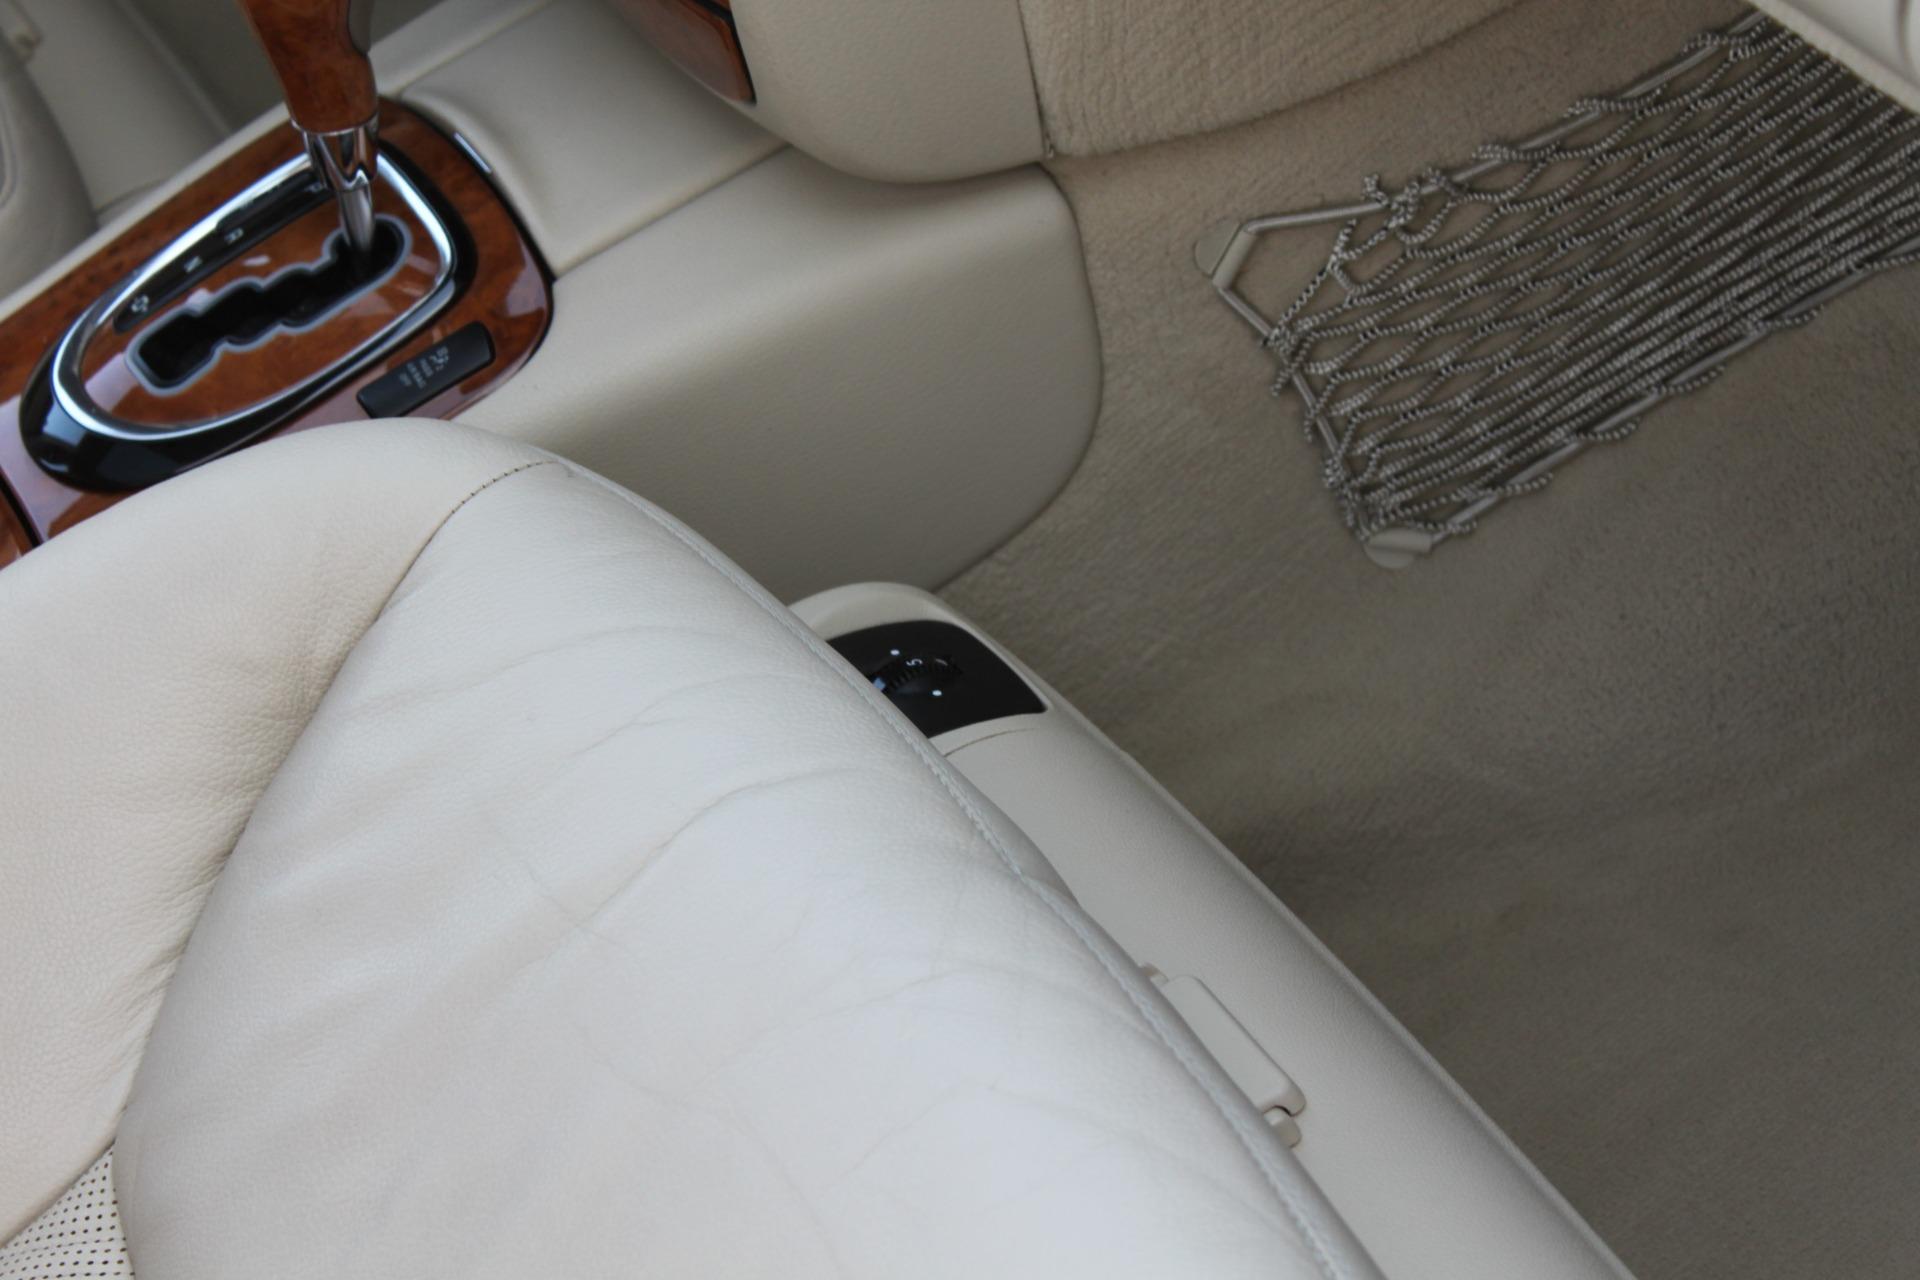 Used-2006-Mercedes-Benz-S-Class-43L-Lexus